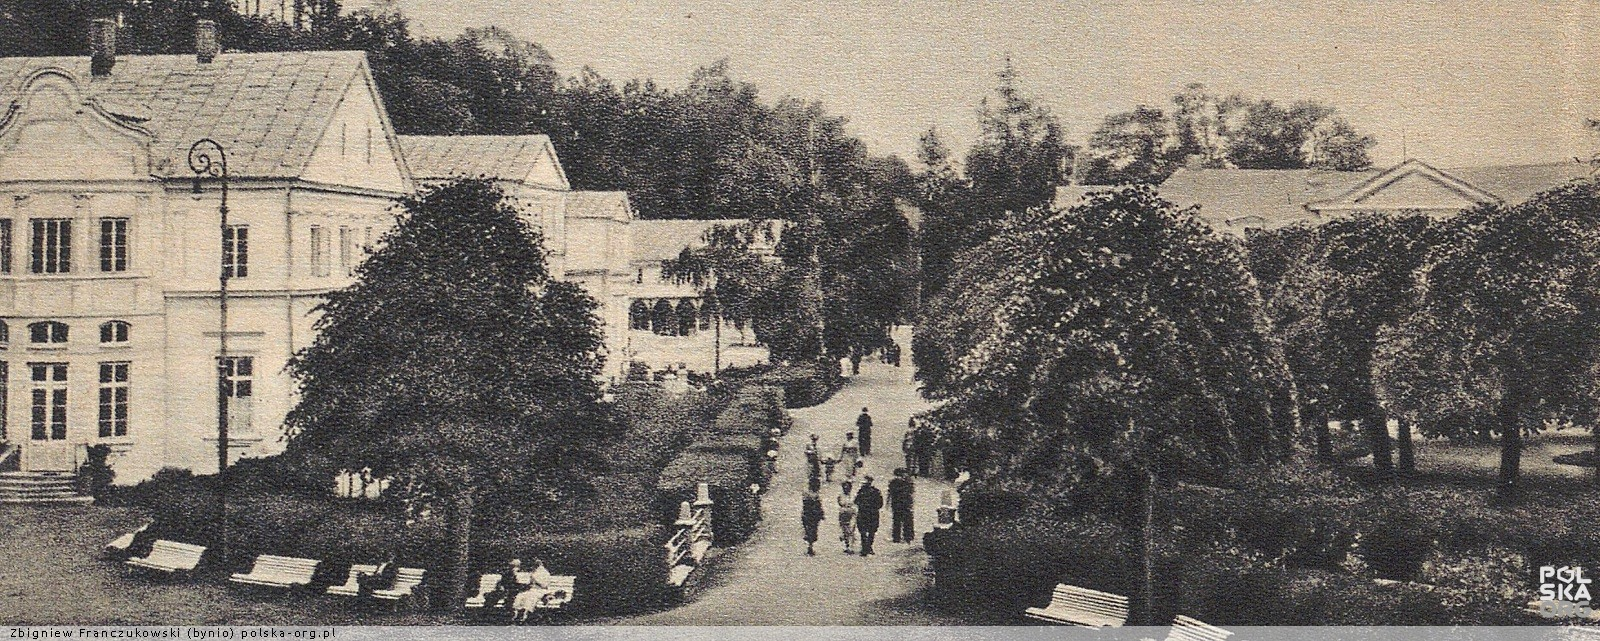 Sanatorium Uzdrowiskowe Stare łazienki Pl Karola I Józefa